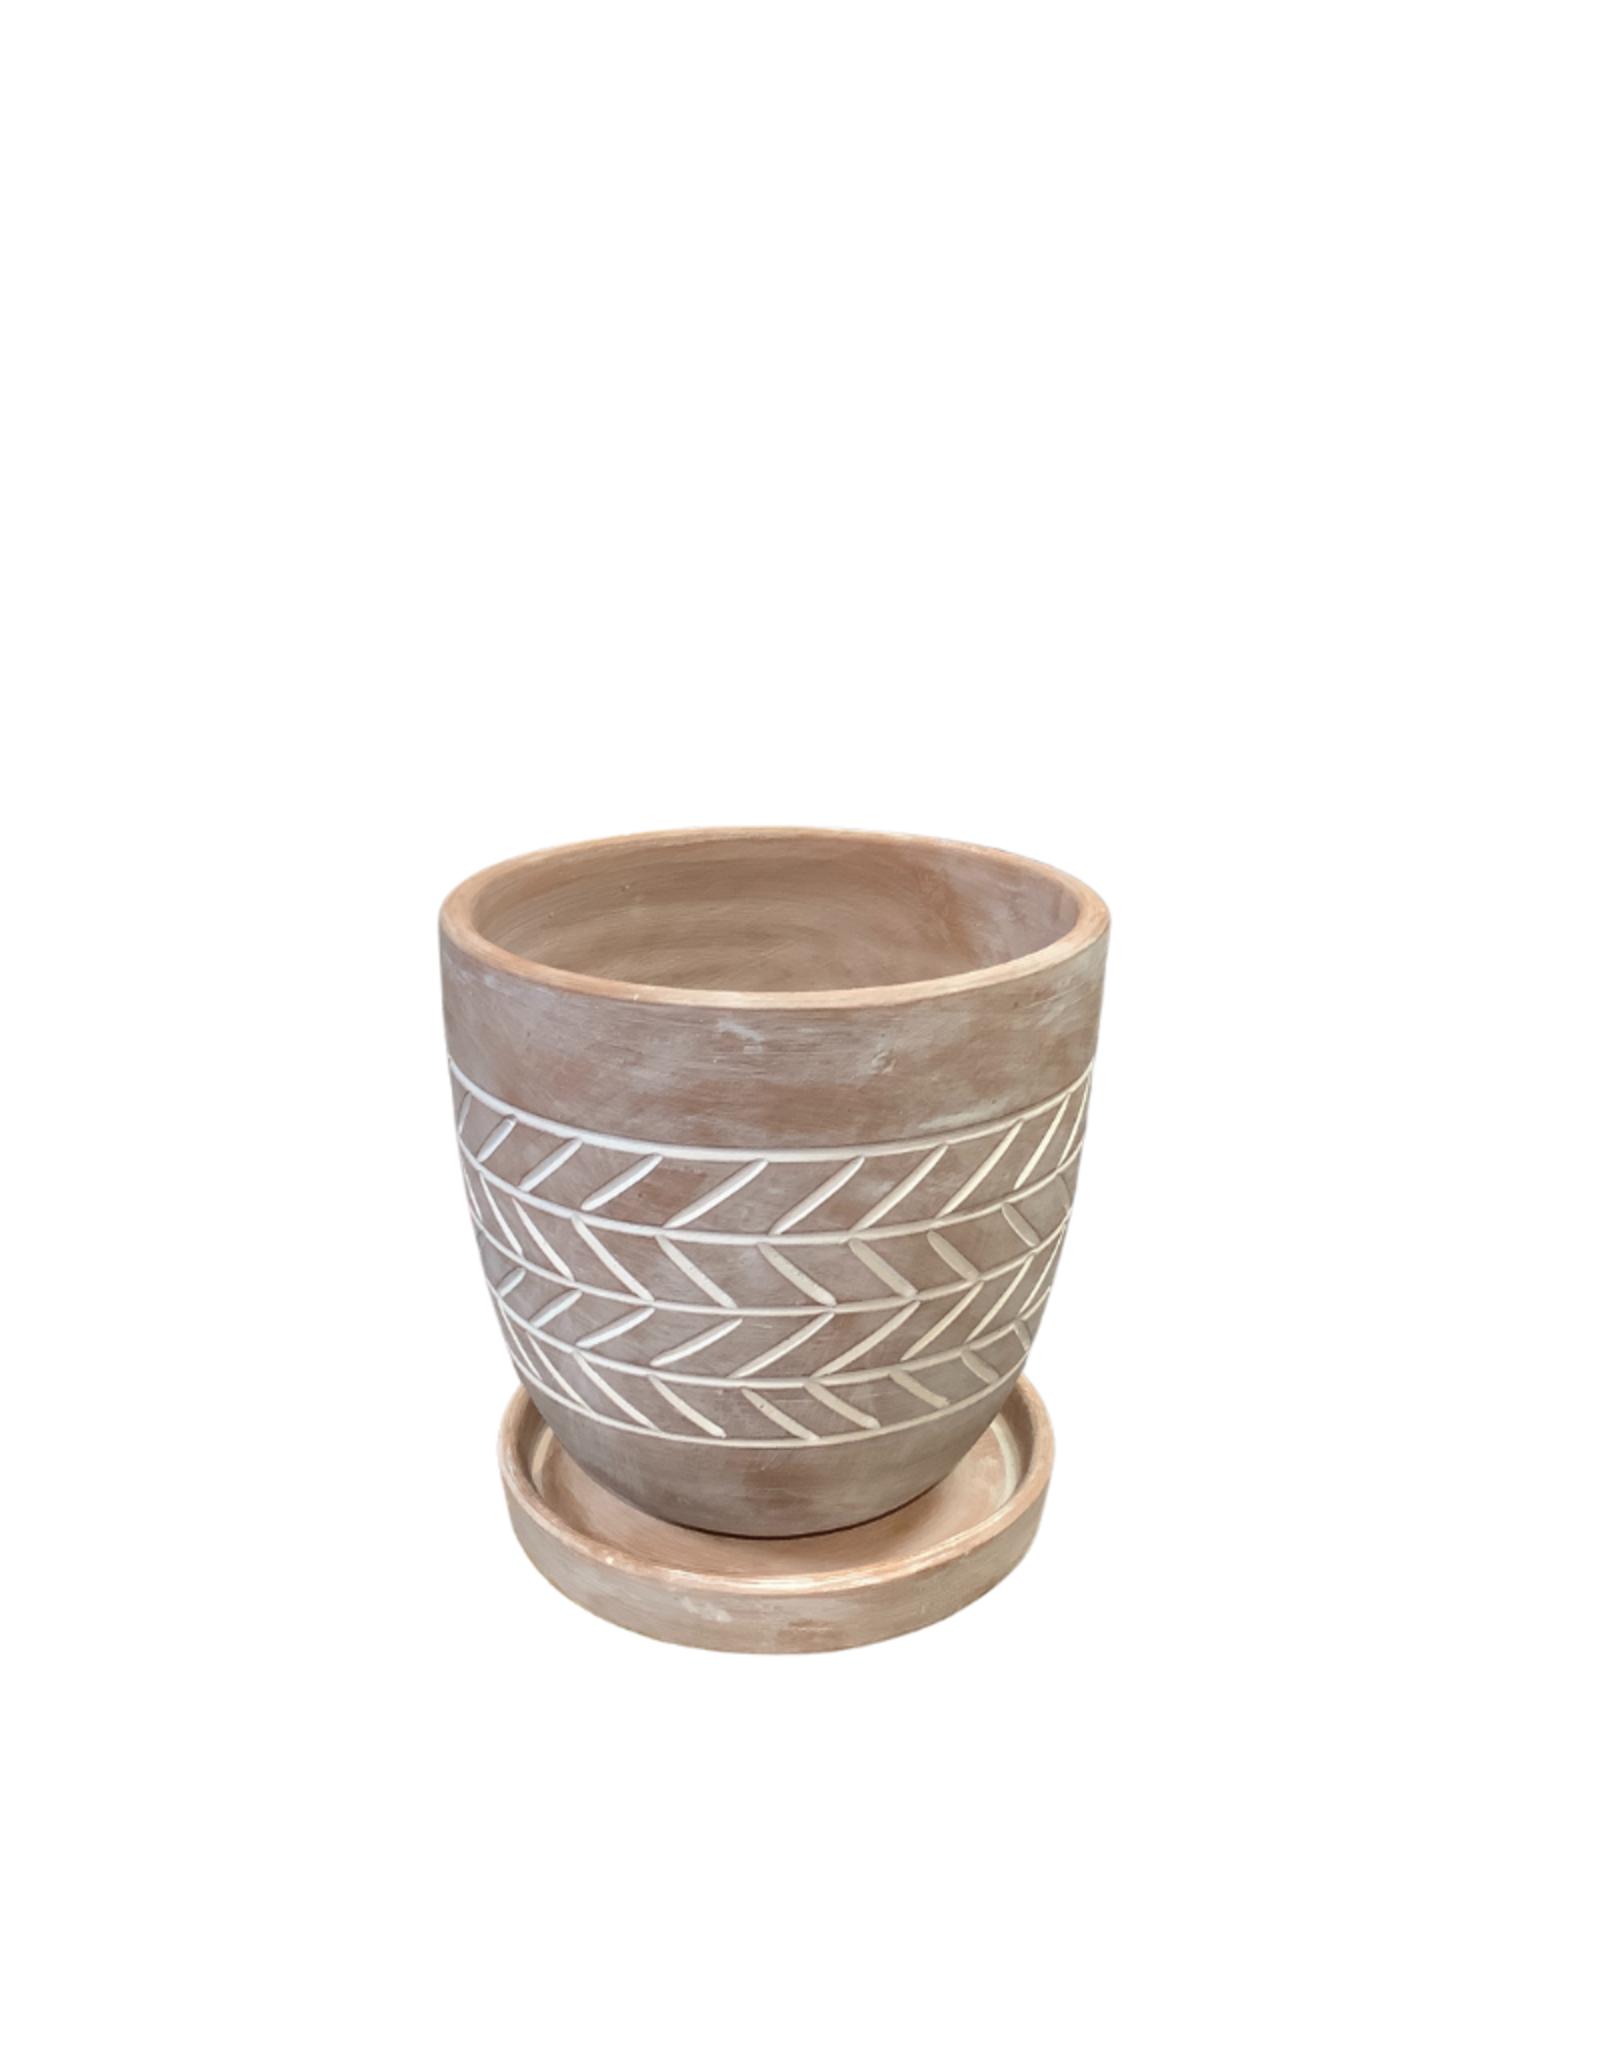 Herringbone Etched Terracotta Planter (S)